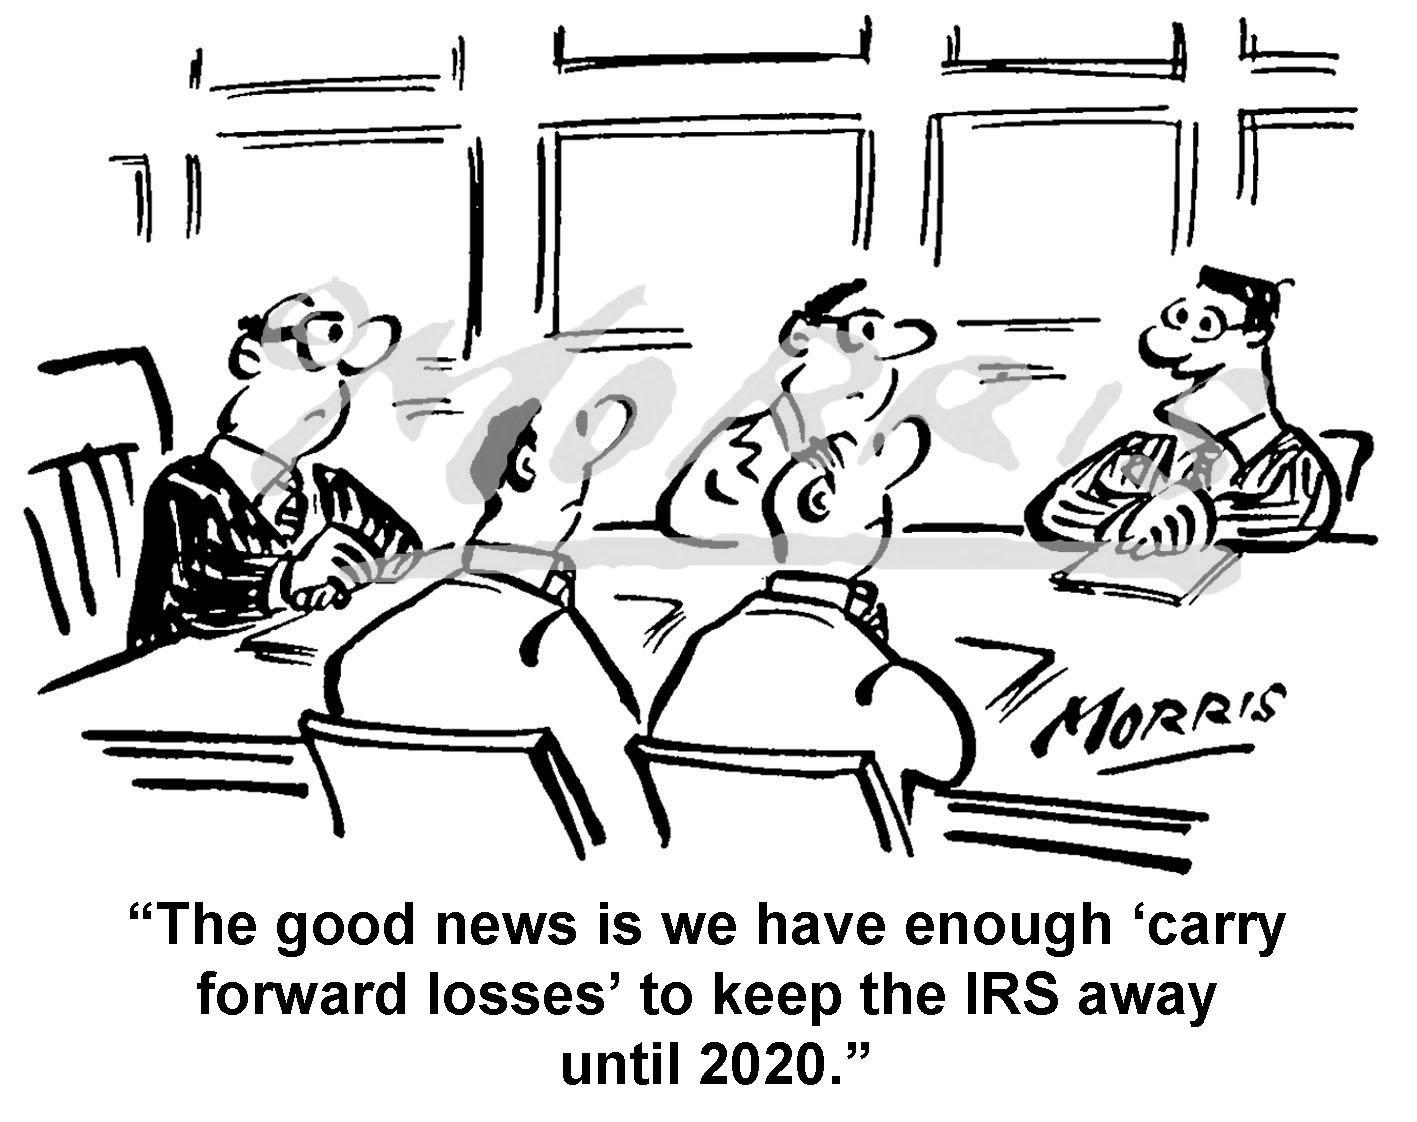 Boardroom meeting tax audit cartoon – Ref: 1499bwus